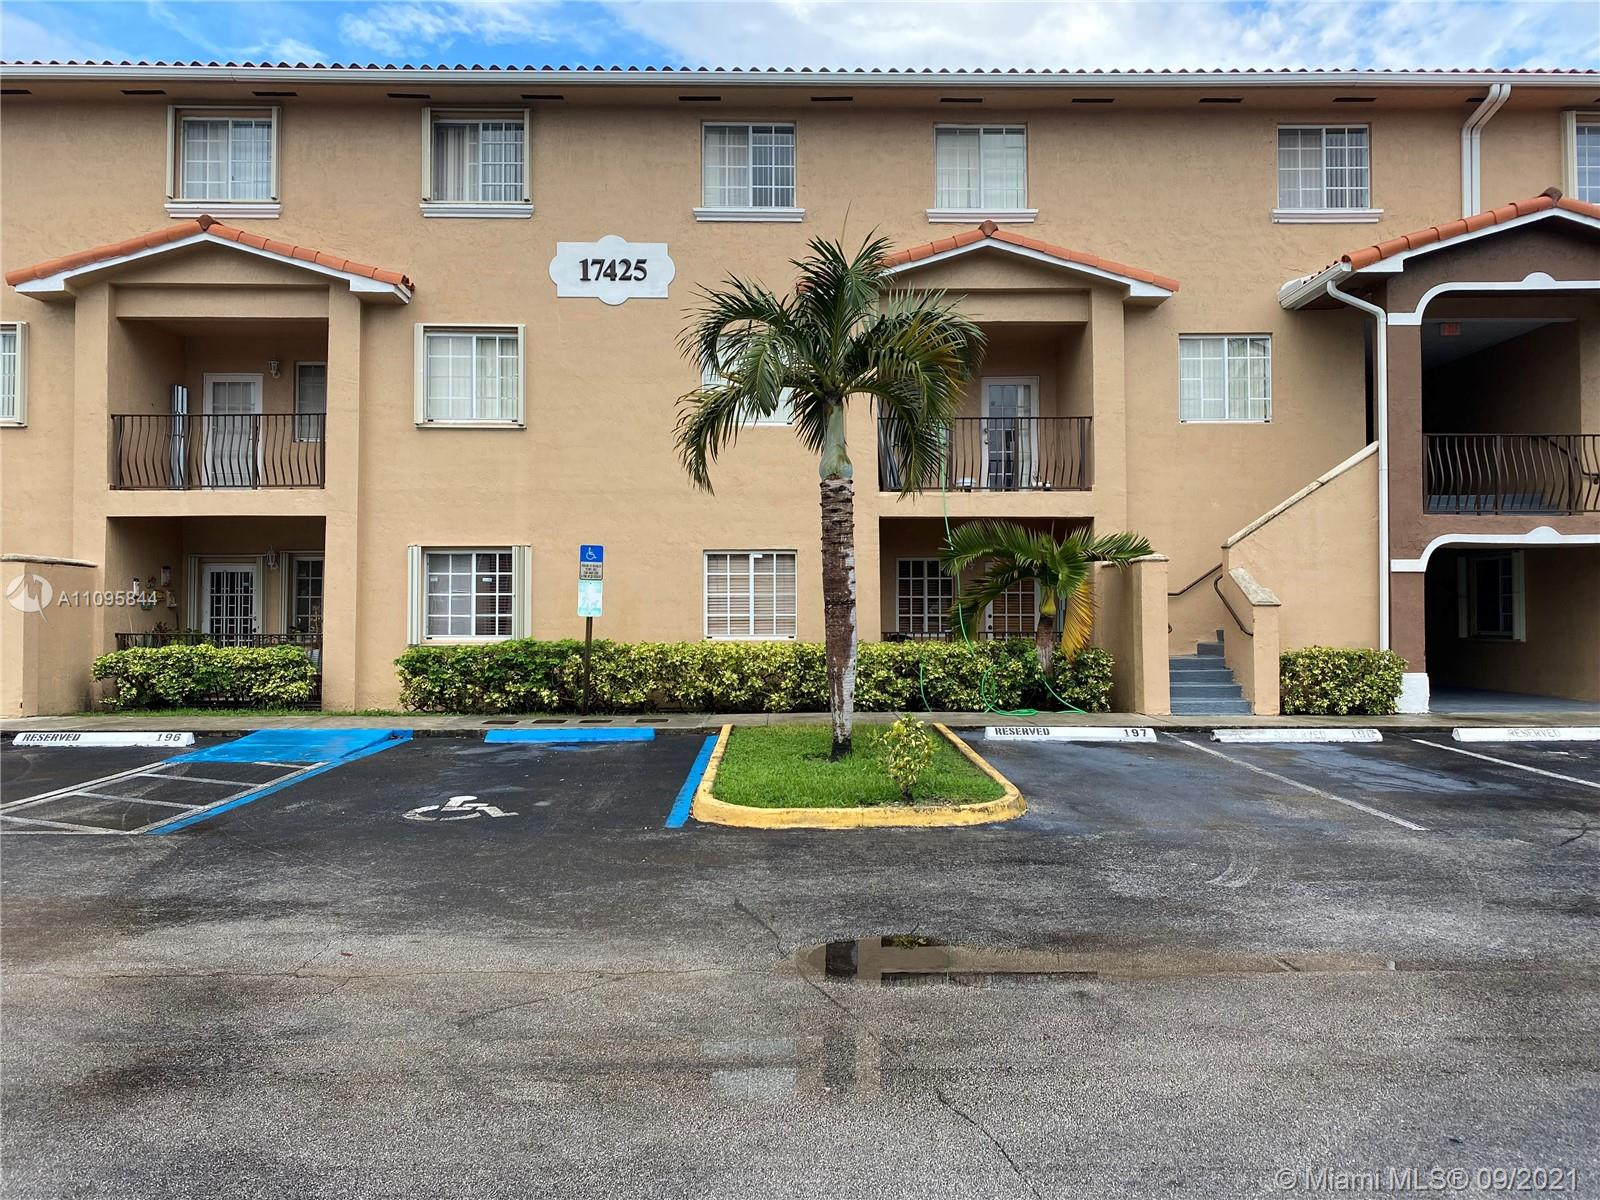 17425 75th Pl Unit 105, Hialeah, Florida 33015